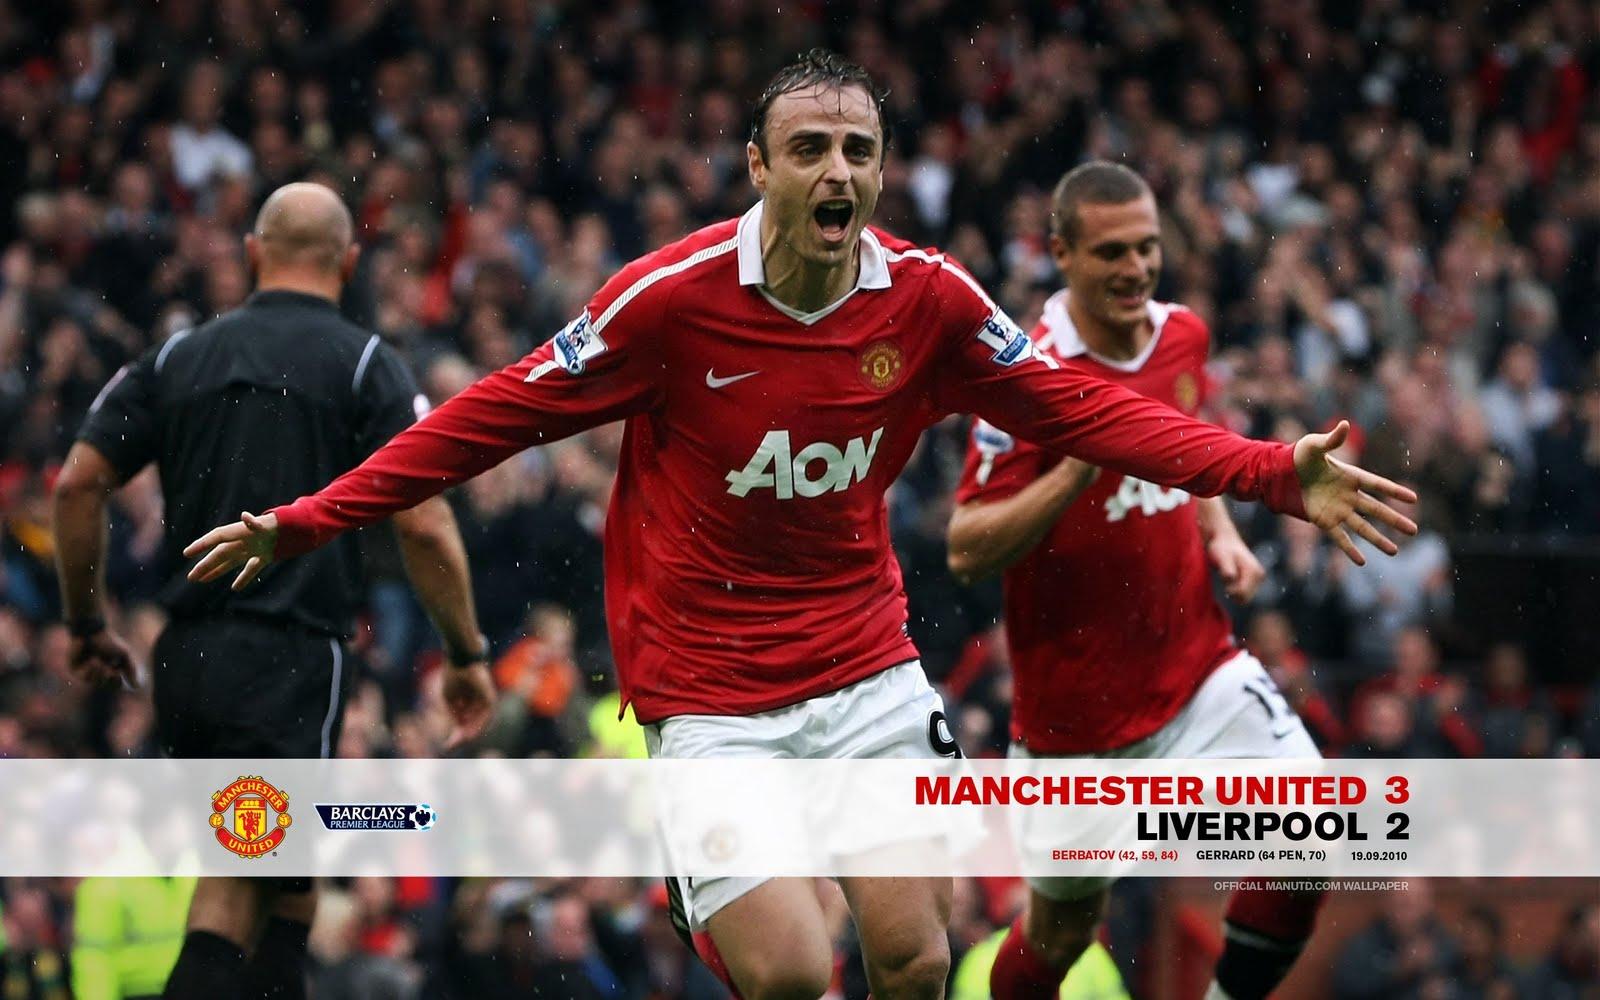 Man United Malaysia No 1 Fan Manchester United Vs Liverpool 2010 11 Wallpaper